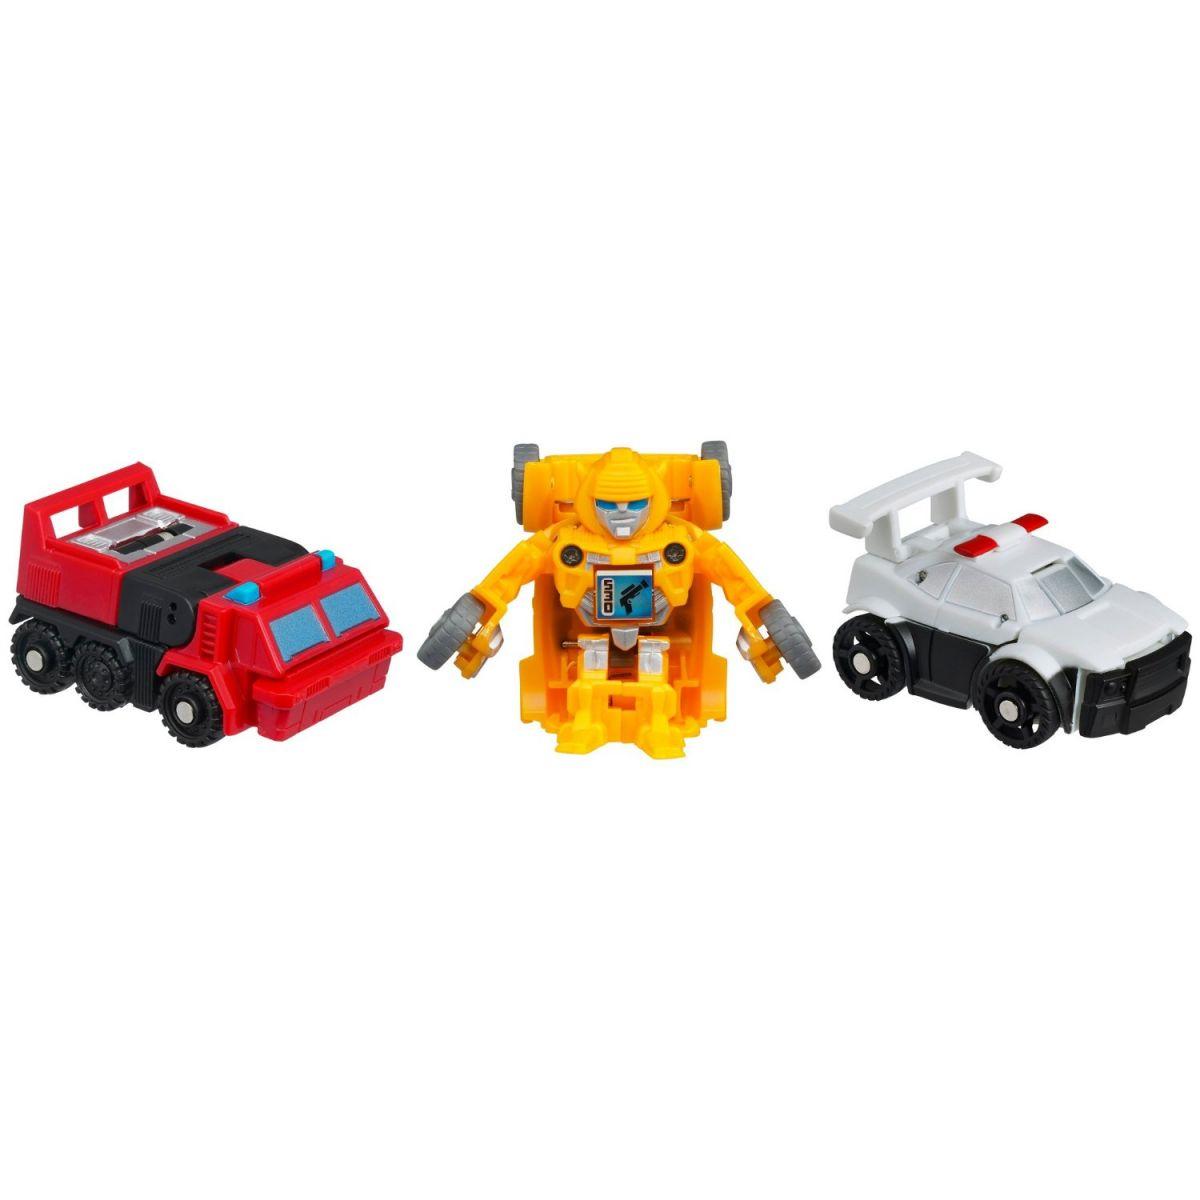 Transformers BOT SHOTS 3 transformeři Hasbro 37973 - SentinelPrime Prowl Bumblebee